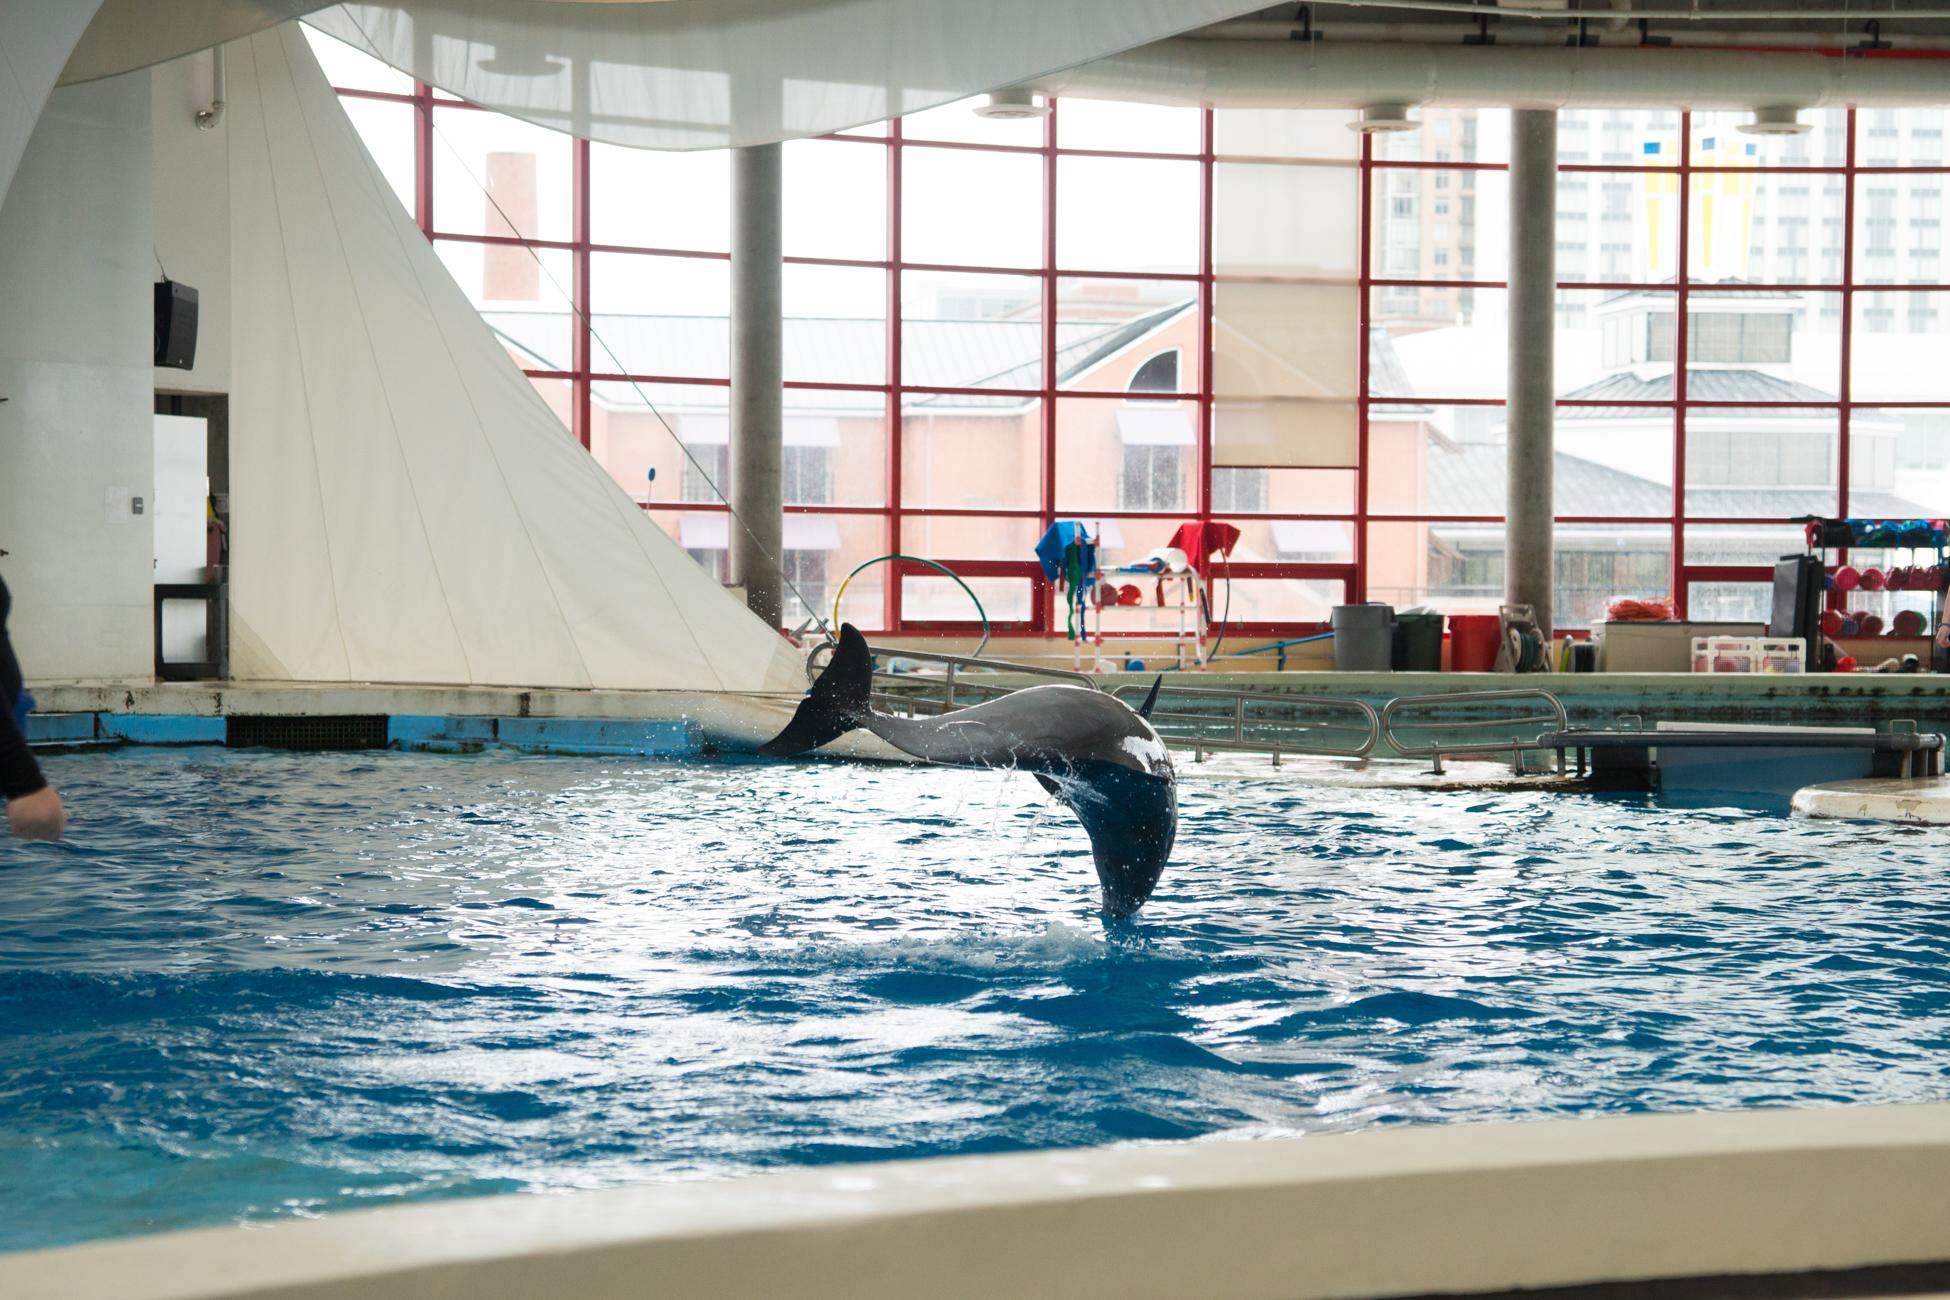 Baltimore Inner Harbor and National Aquarium (c) My3GirlsPhotography May 2017-14.jpg